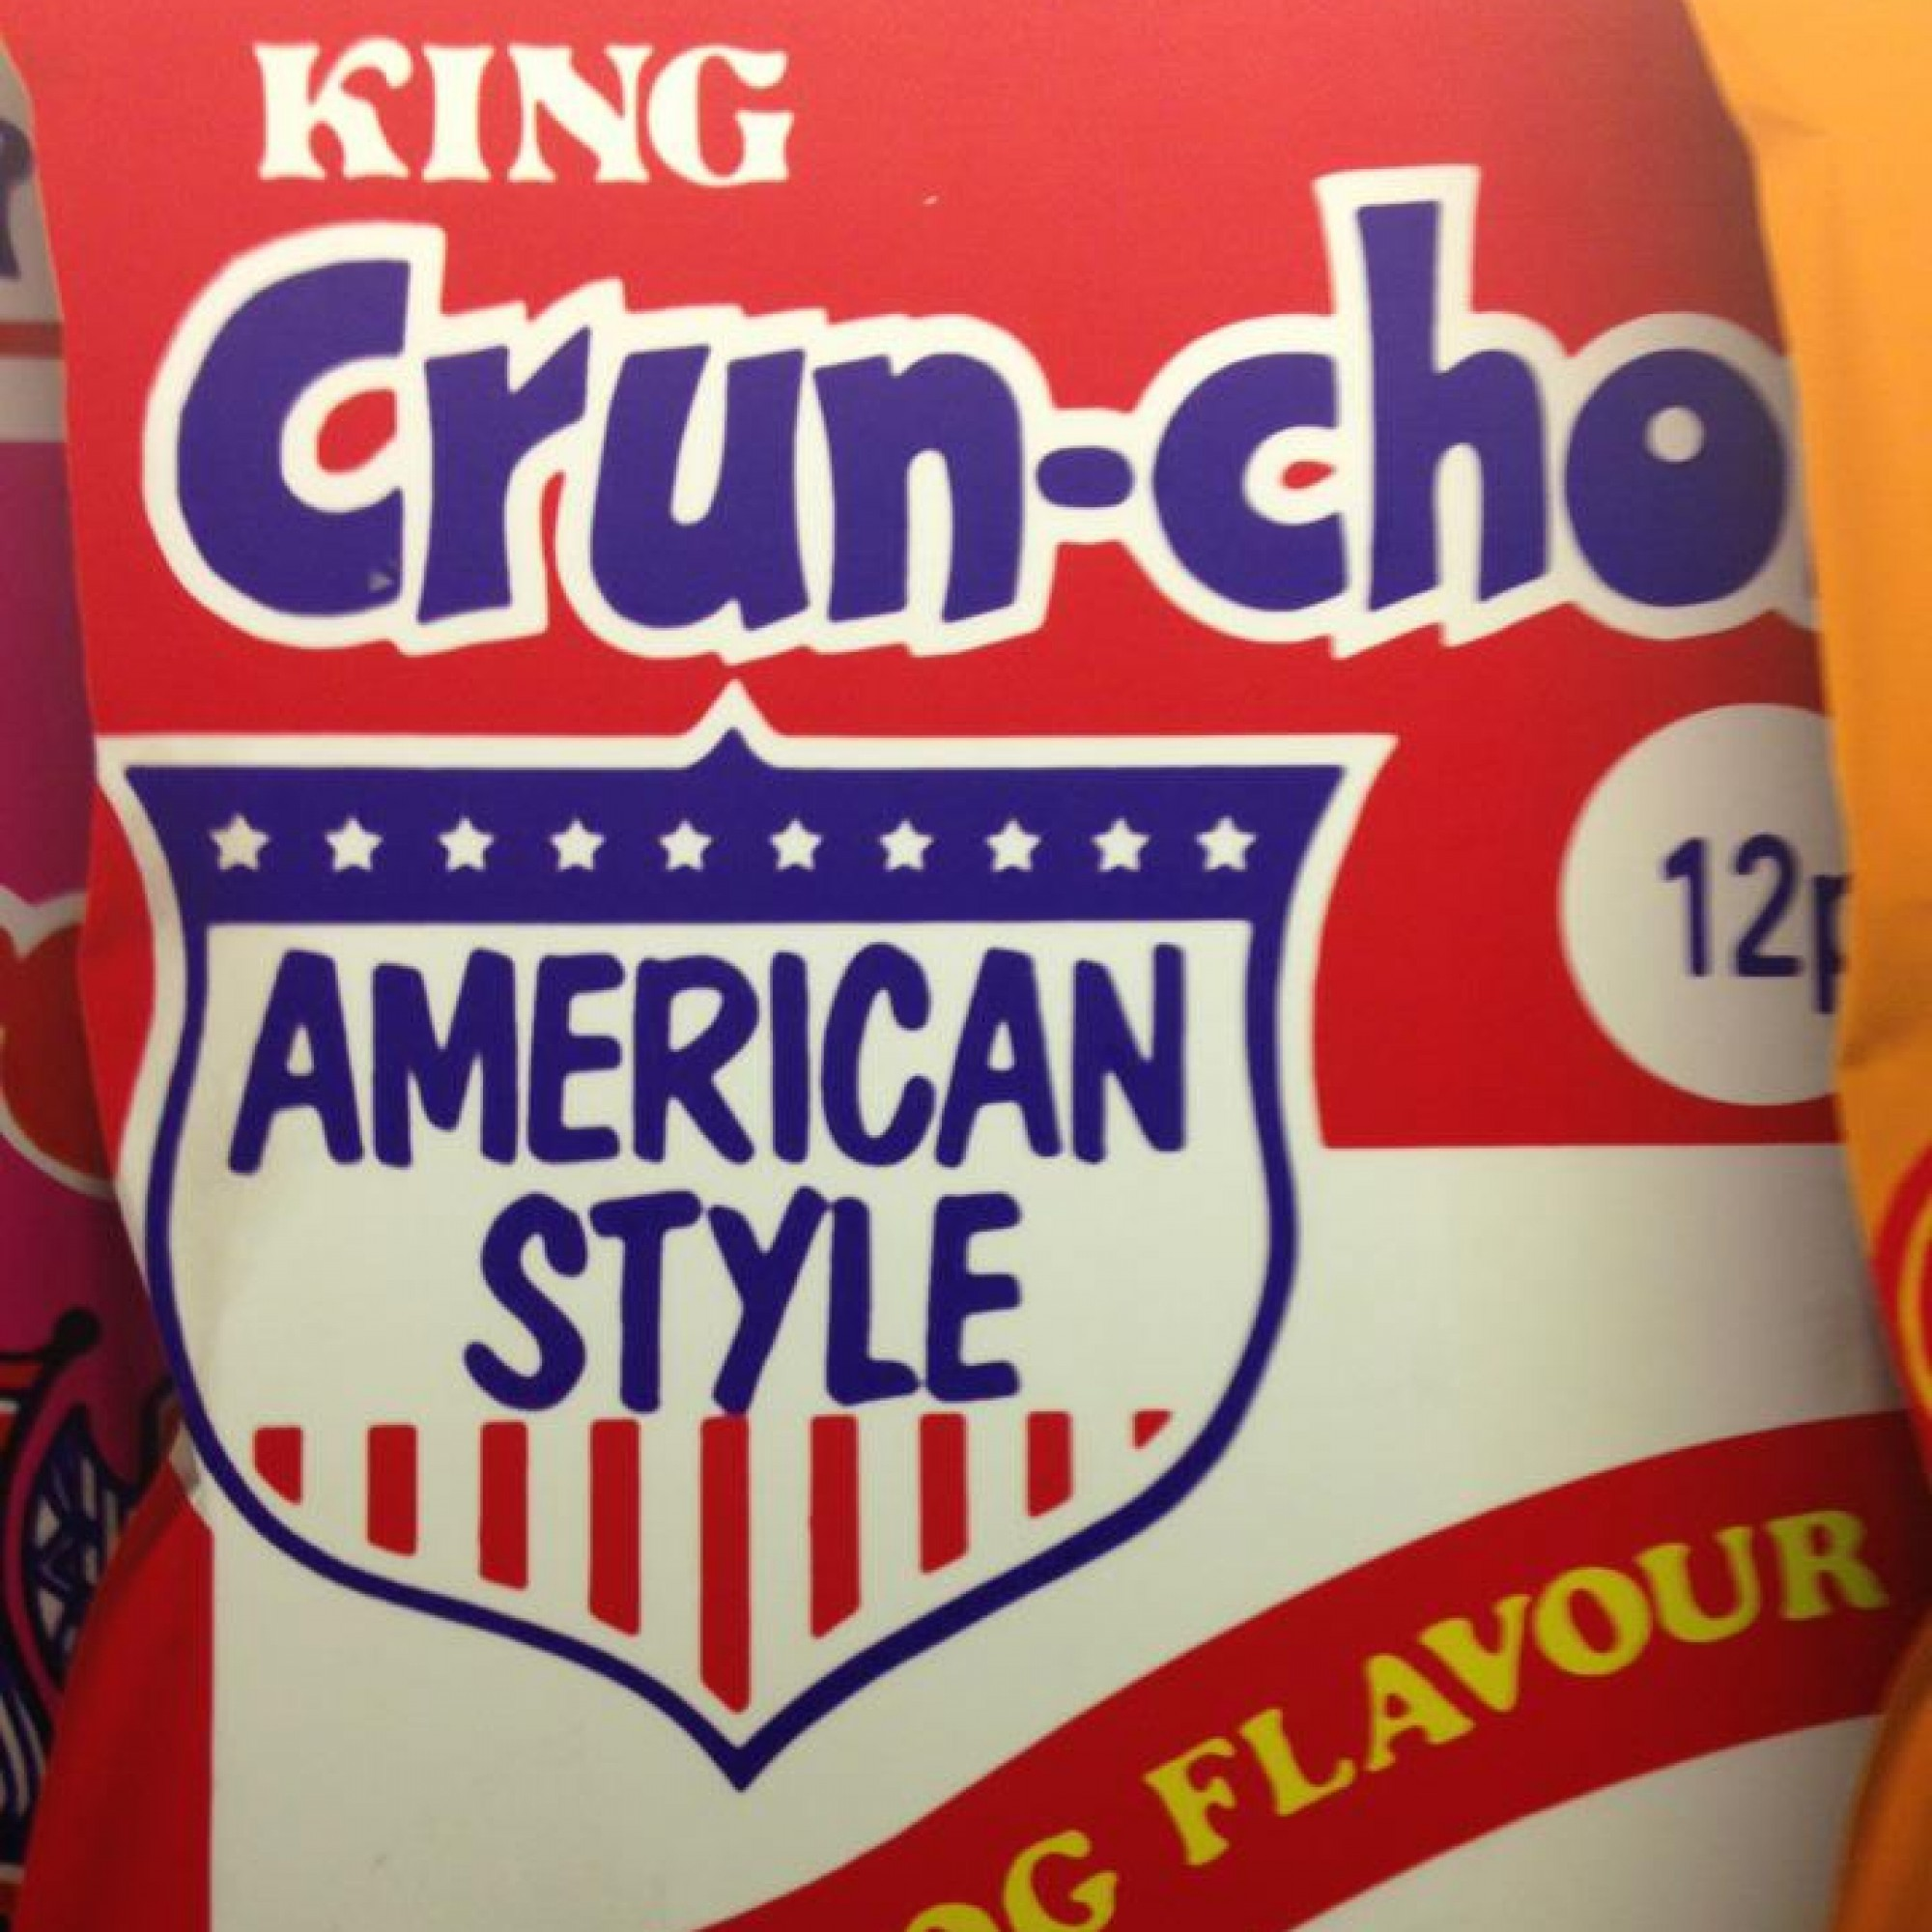 Irish people dearly wish these 90s crisps would make a comeback